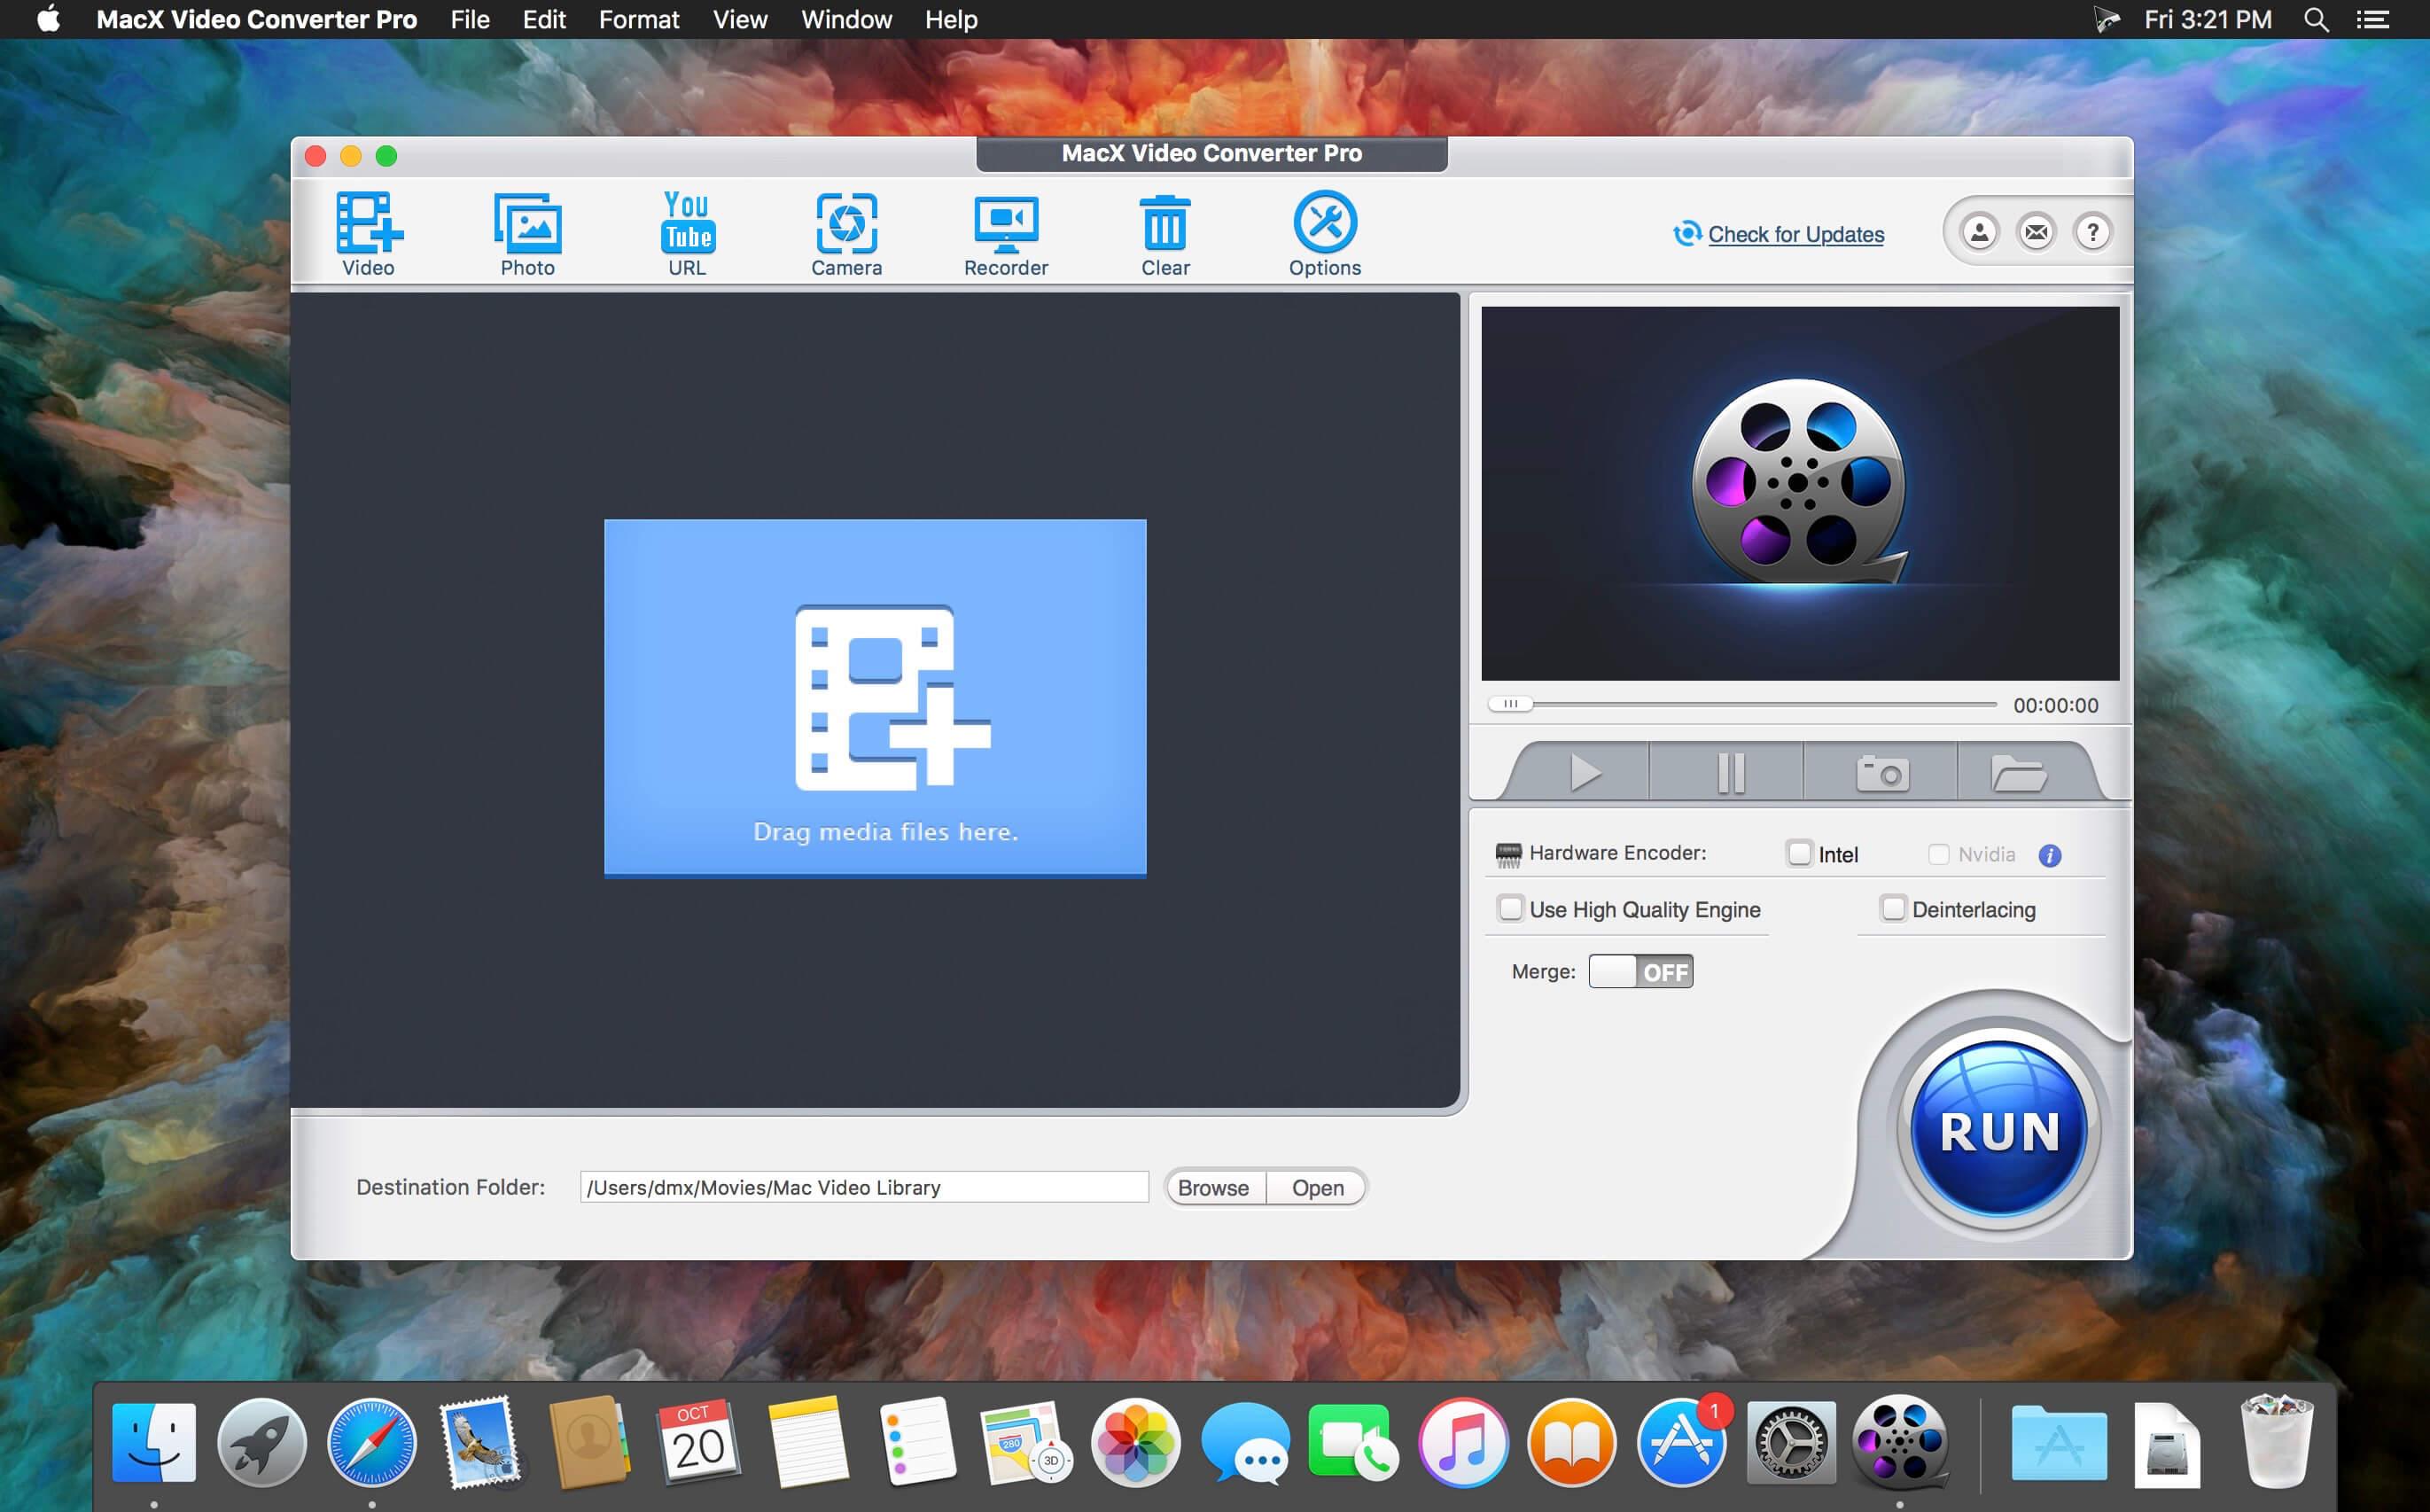 Macx Video Converter Pro 64-Bit